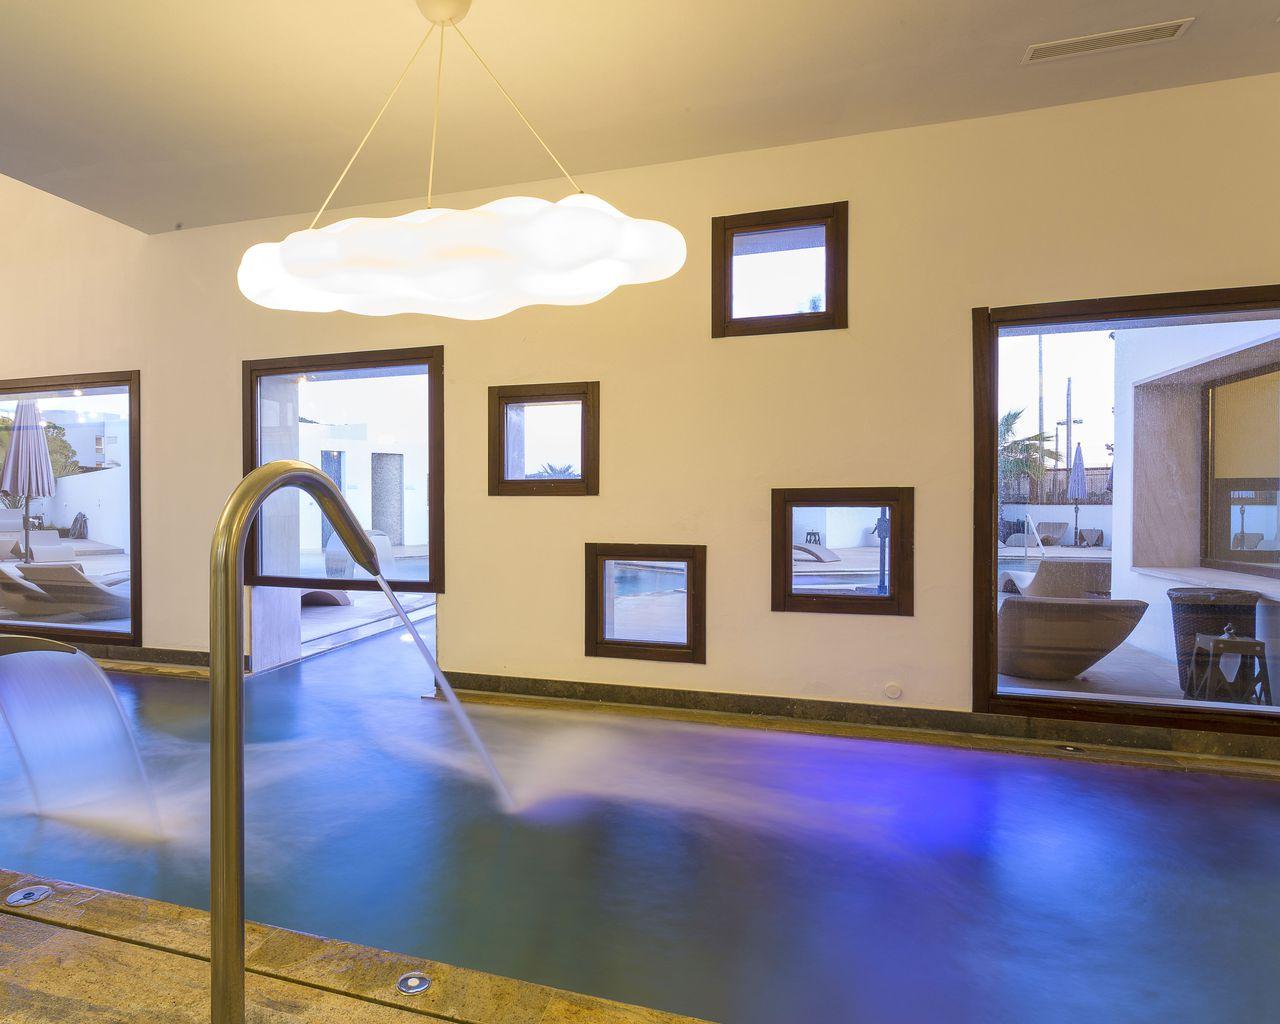 grand-palladium-white-island-spa-iluminacion-elener